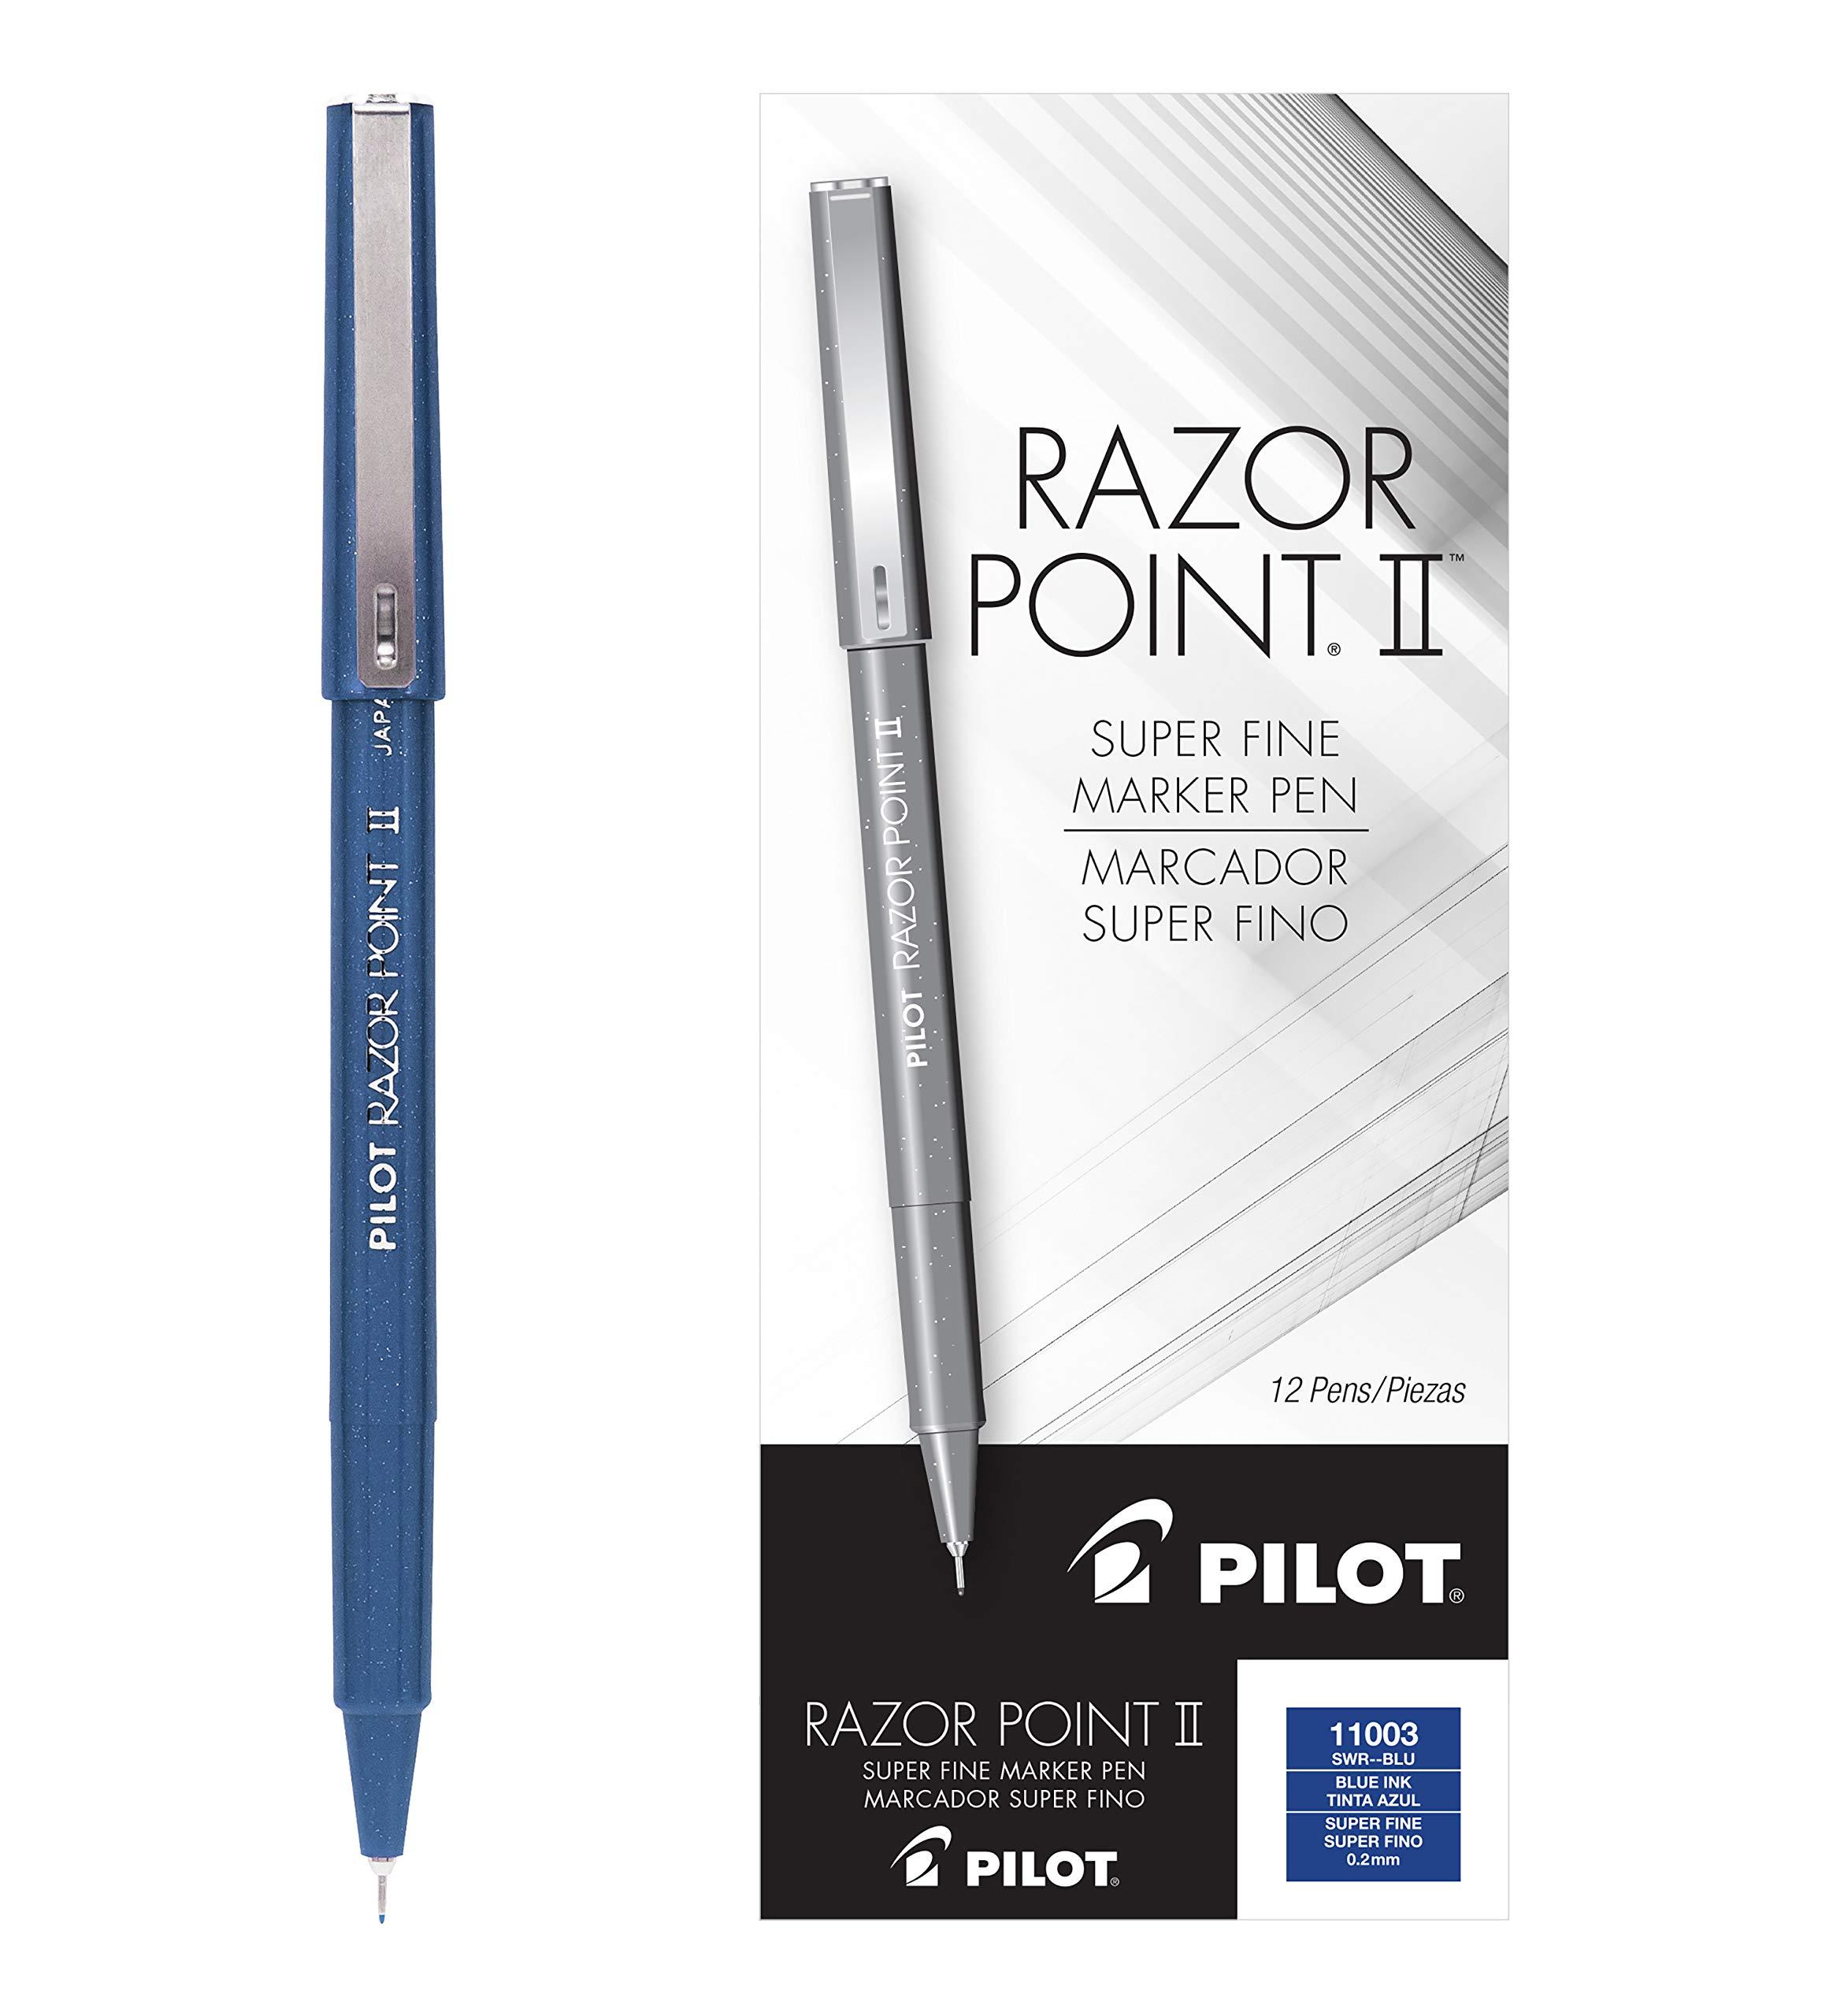 PILOT Razor Point II Fine Line Marker Stick Pens, Super Fine Point (0.2mm) Blue Ink, 12 Count (11003)